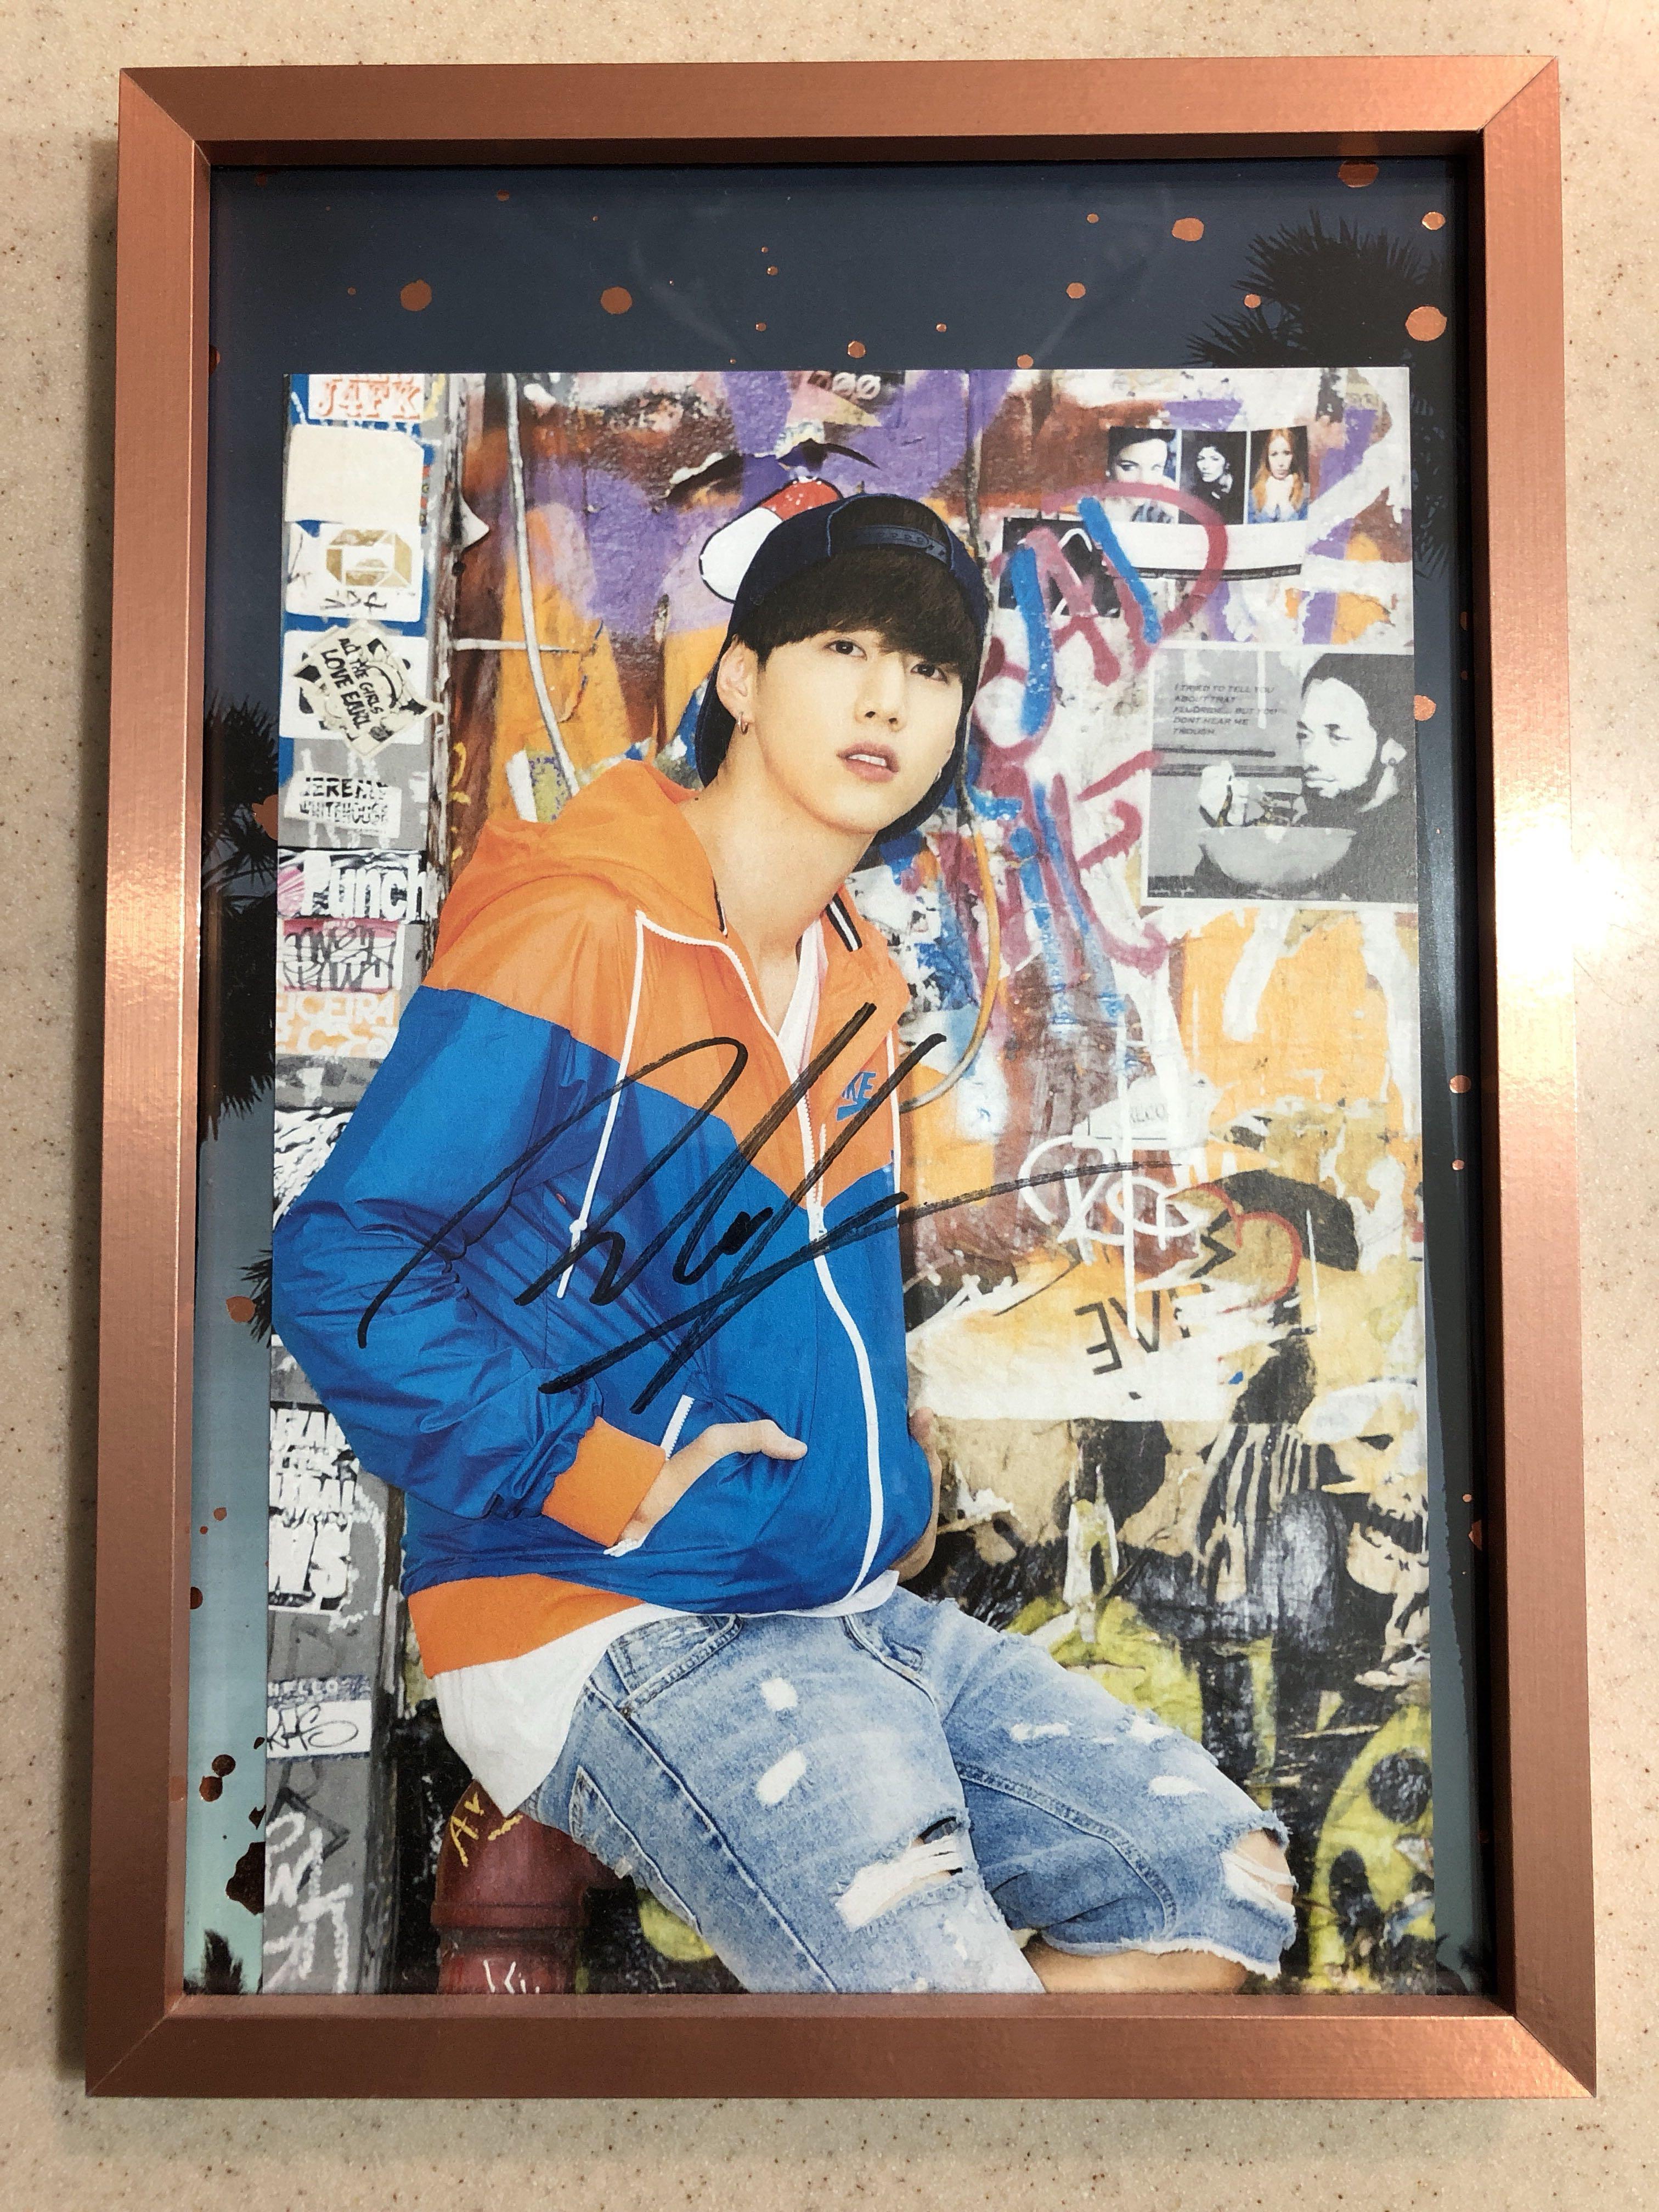 GOT7 Official Mark signed Gotcha Perfect Getaway in L.A. Postcard